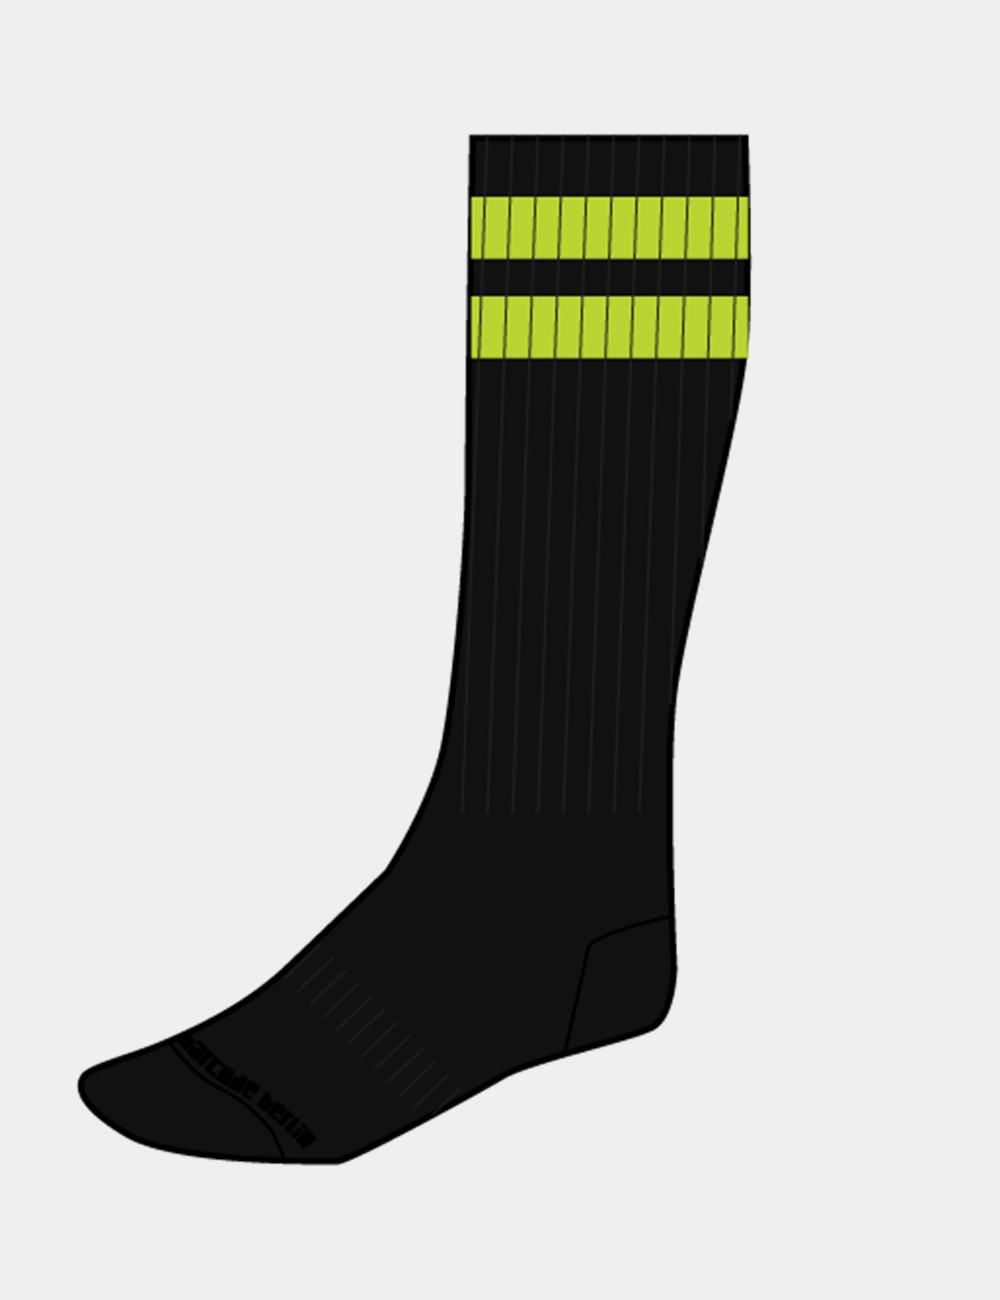 Gym Socks - Black-Green